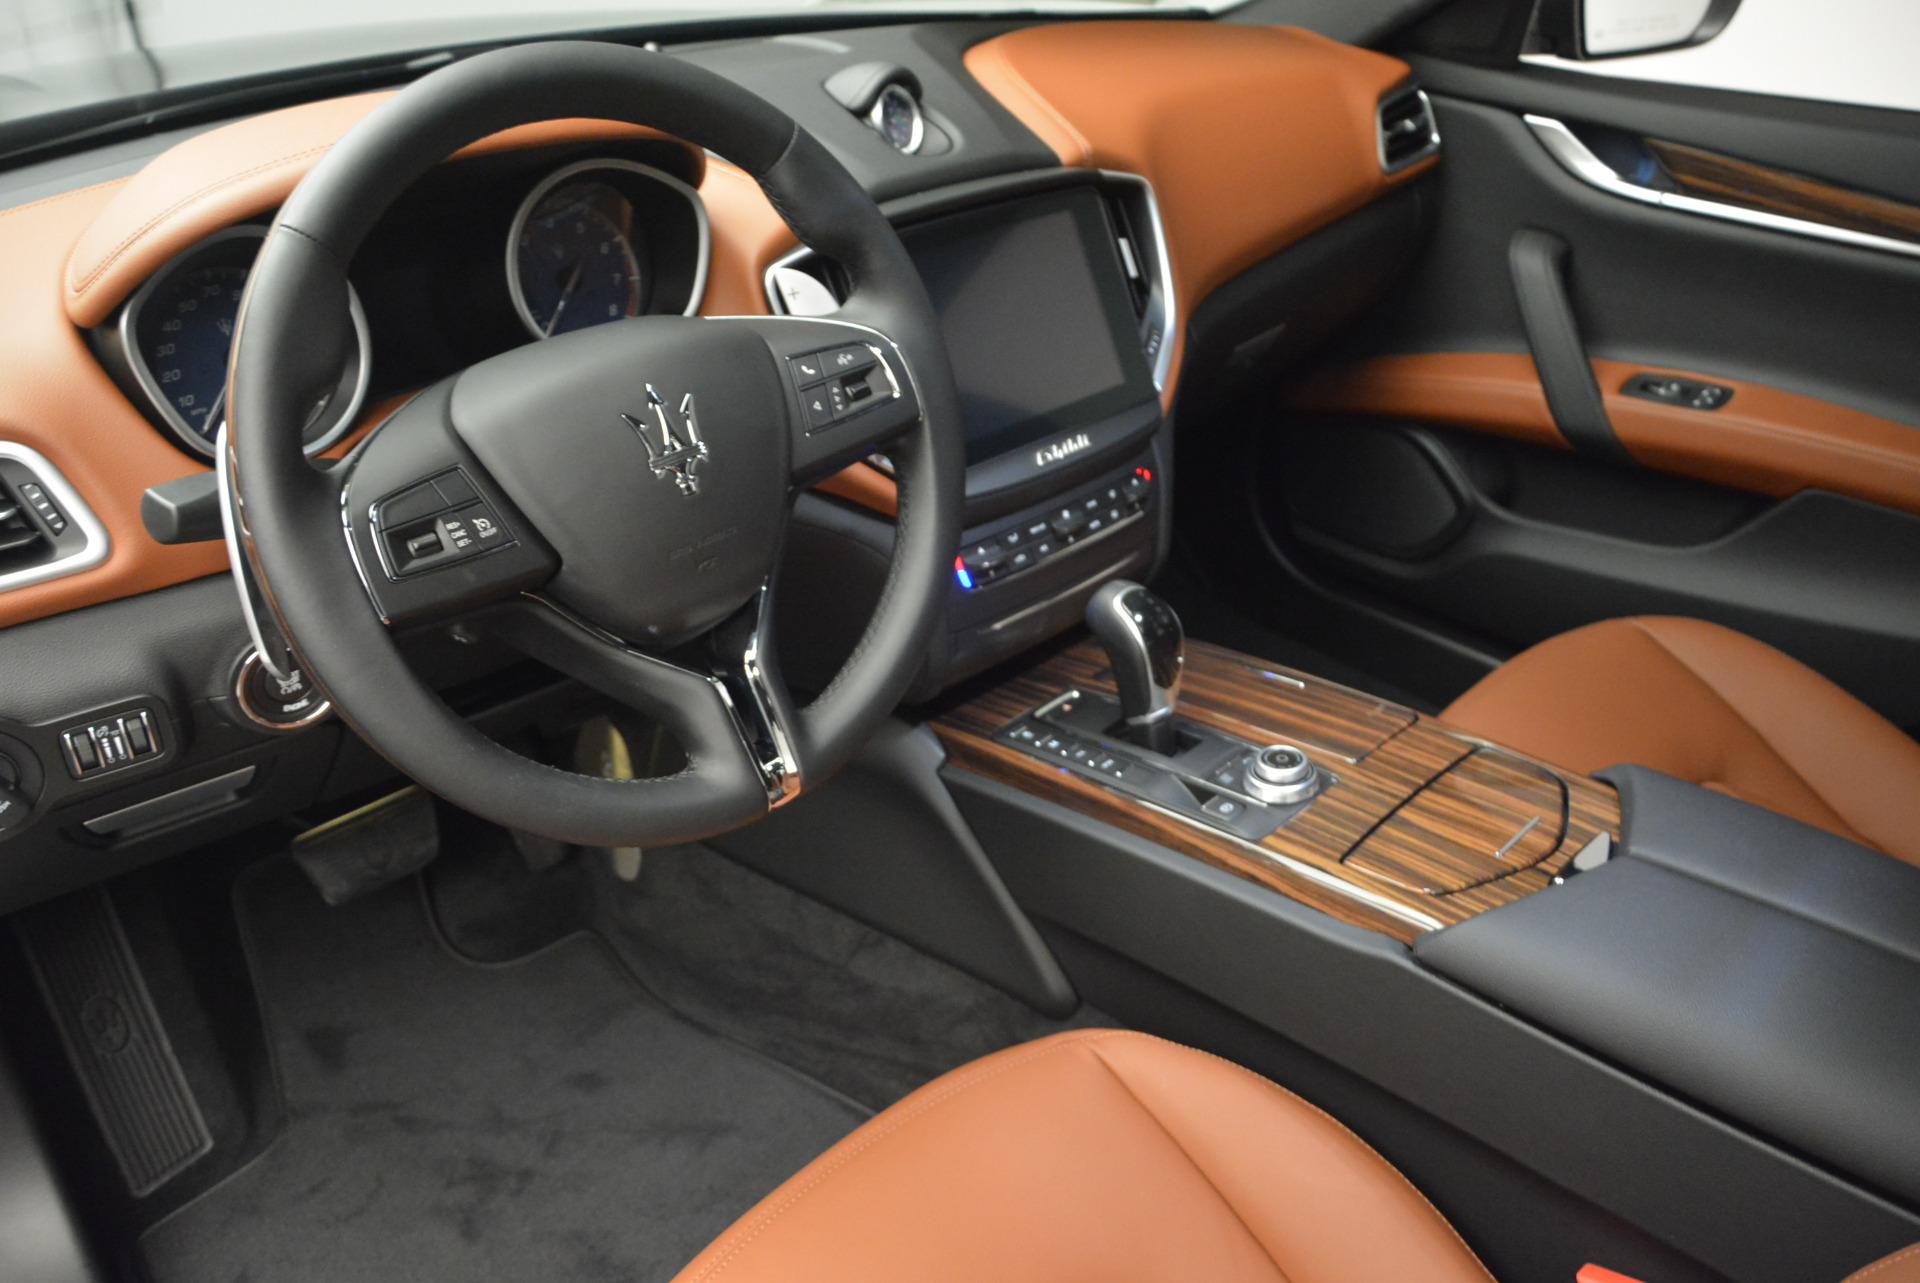 Used 2017 Maserati Ghibli S Q4  EX-LOANER For Sale In Westport, CT 565_p13